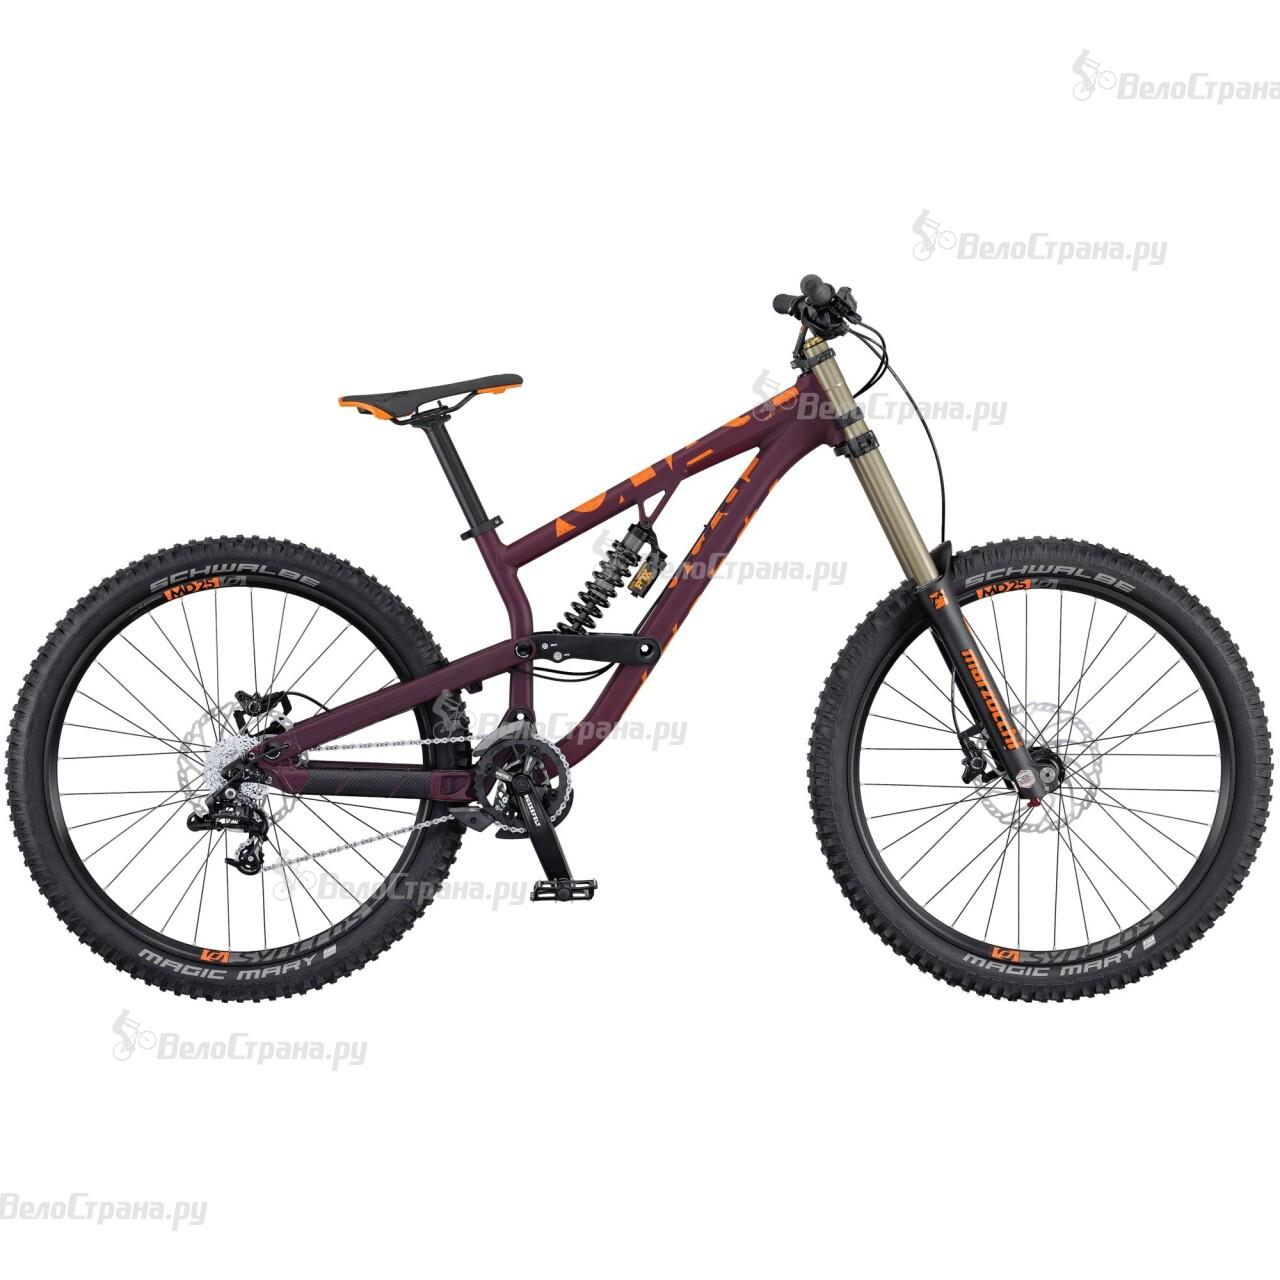 Велосипед Scott Voltage FR 720 (2016) велосипед scott aspect 700 27 5 2016